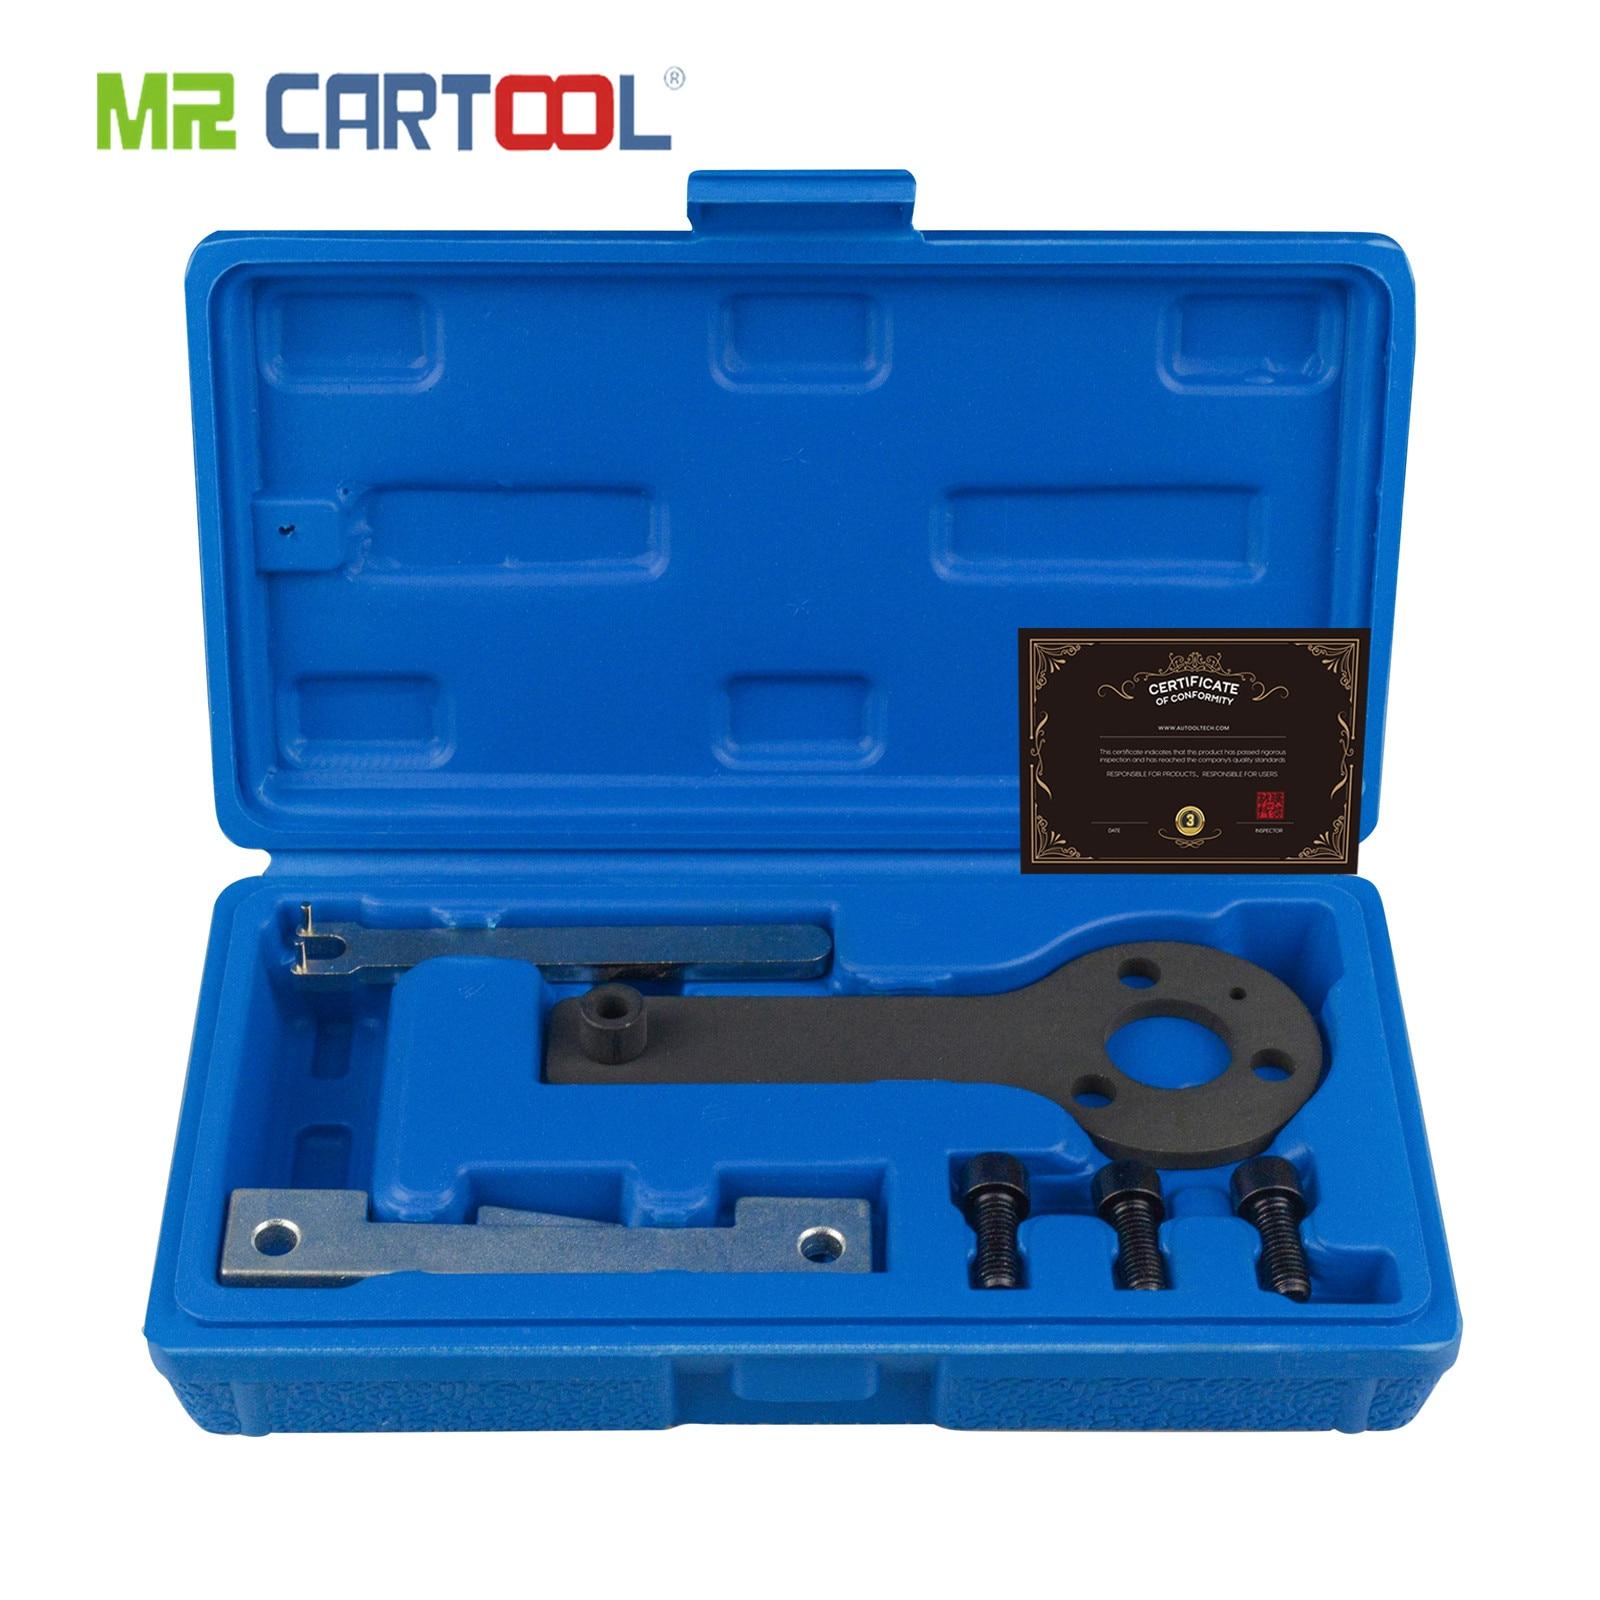 MR CARTOOL Auto Petrol Engine Camshaft Locking Timing Tool Kit For Fiat 500 / Punto Evo/Panda / 1.1,